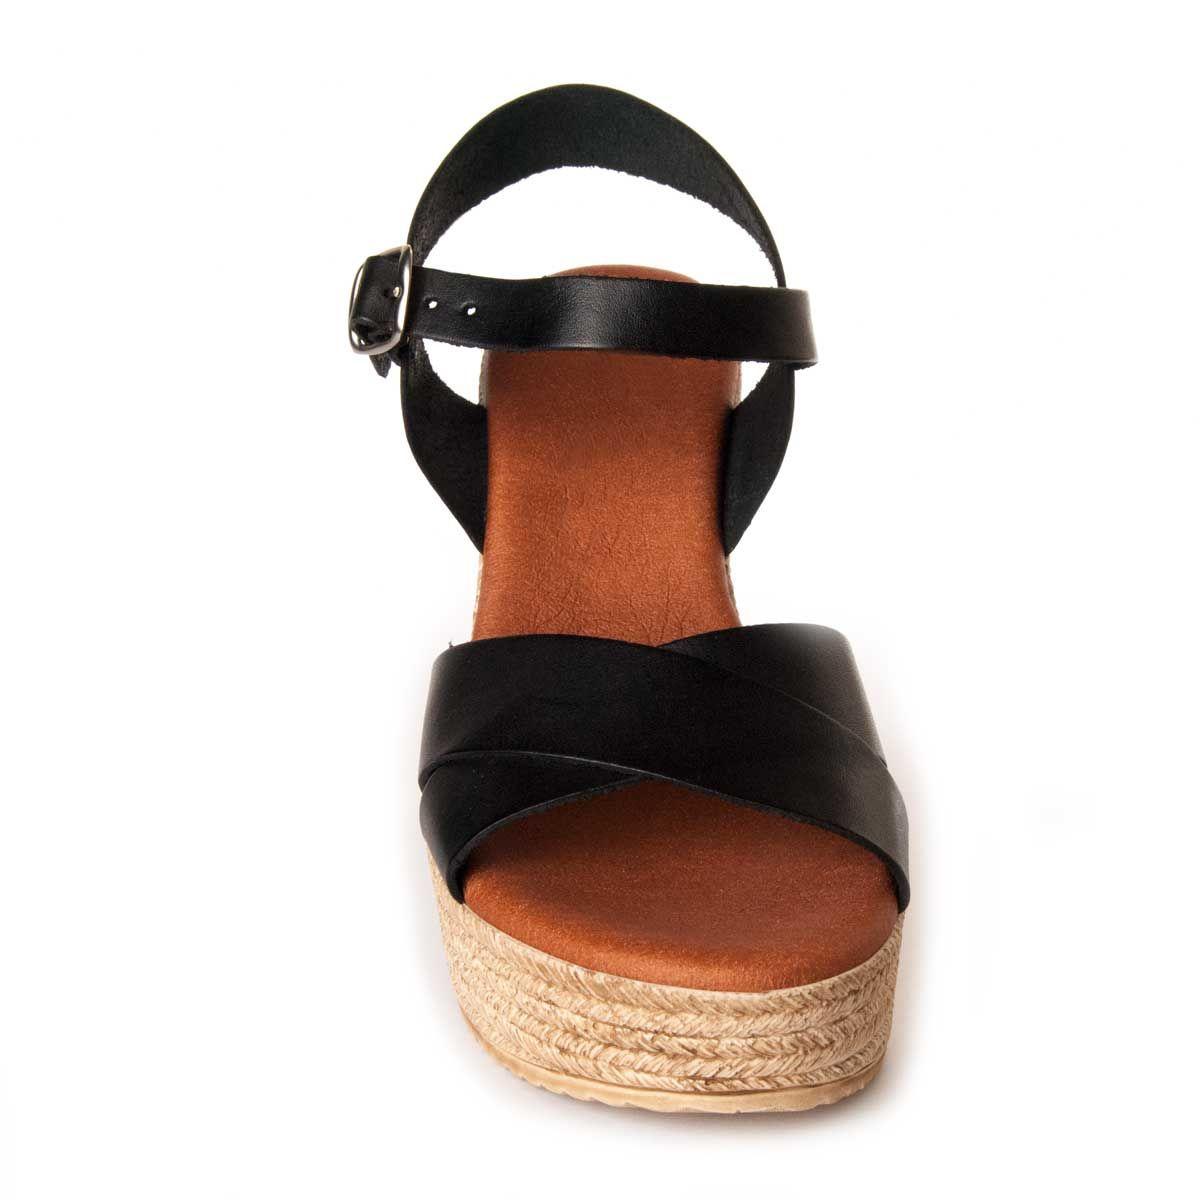 Leindia Platform Sandal in Black